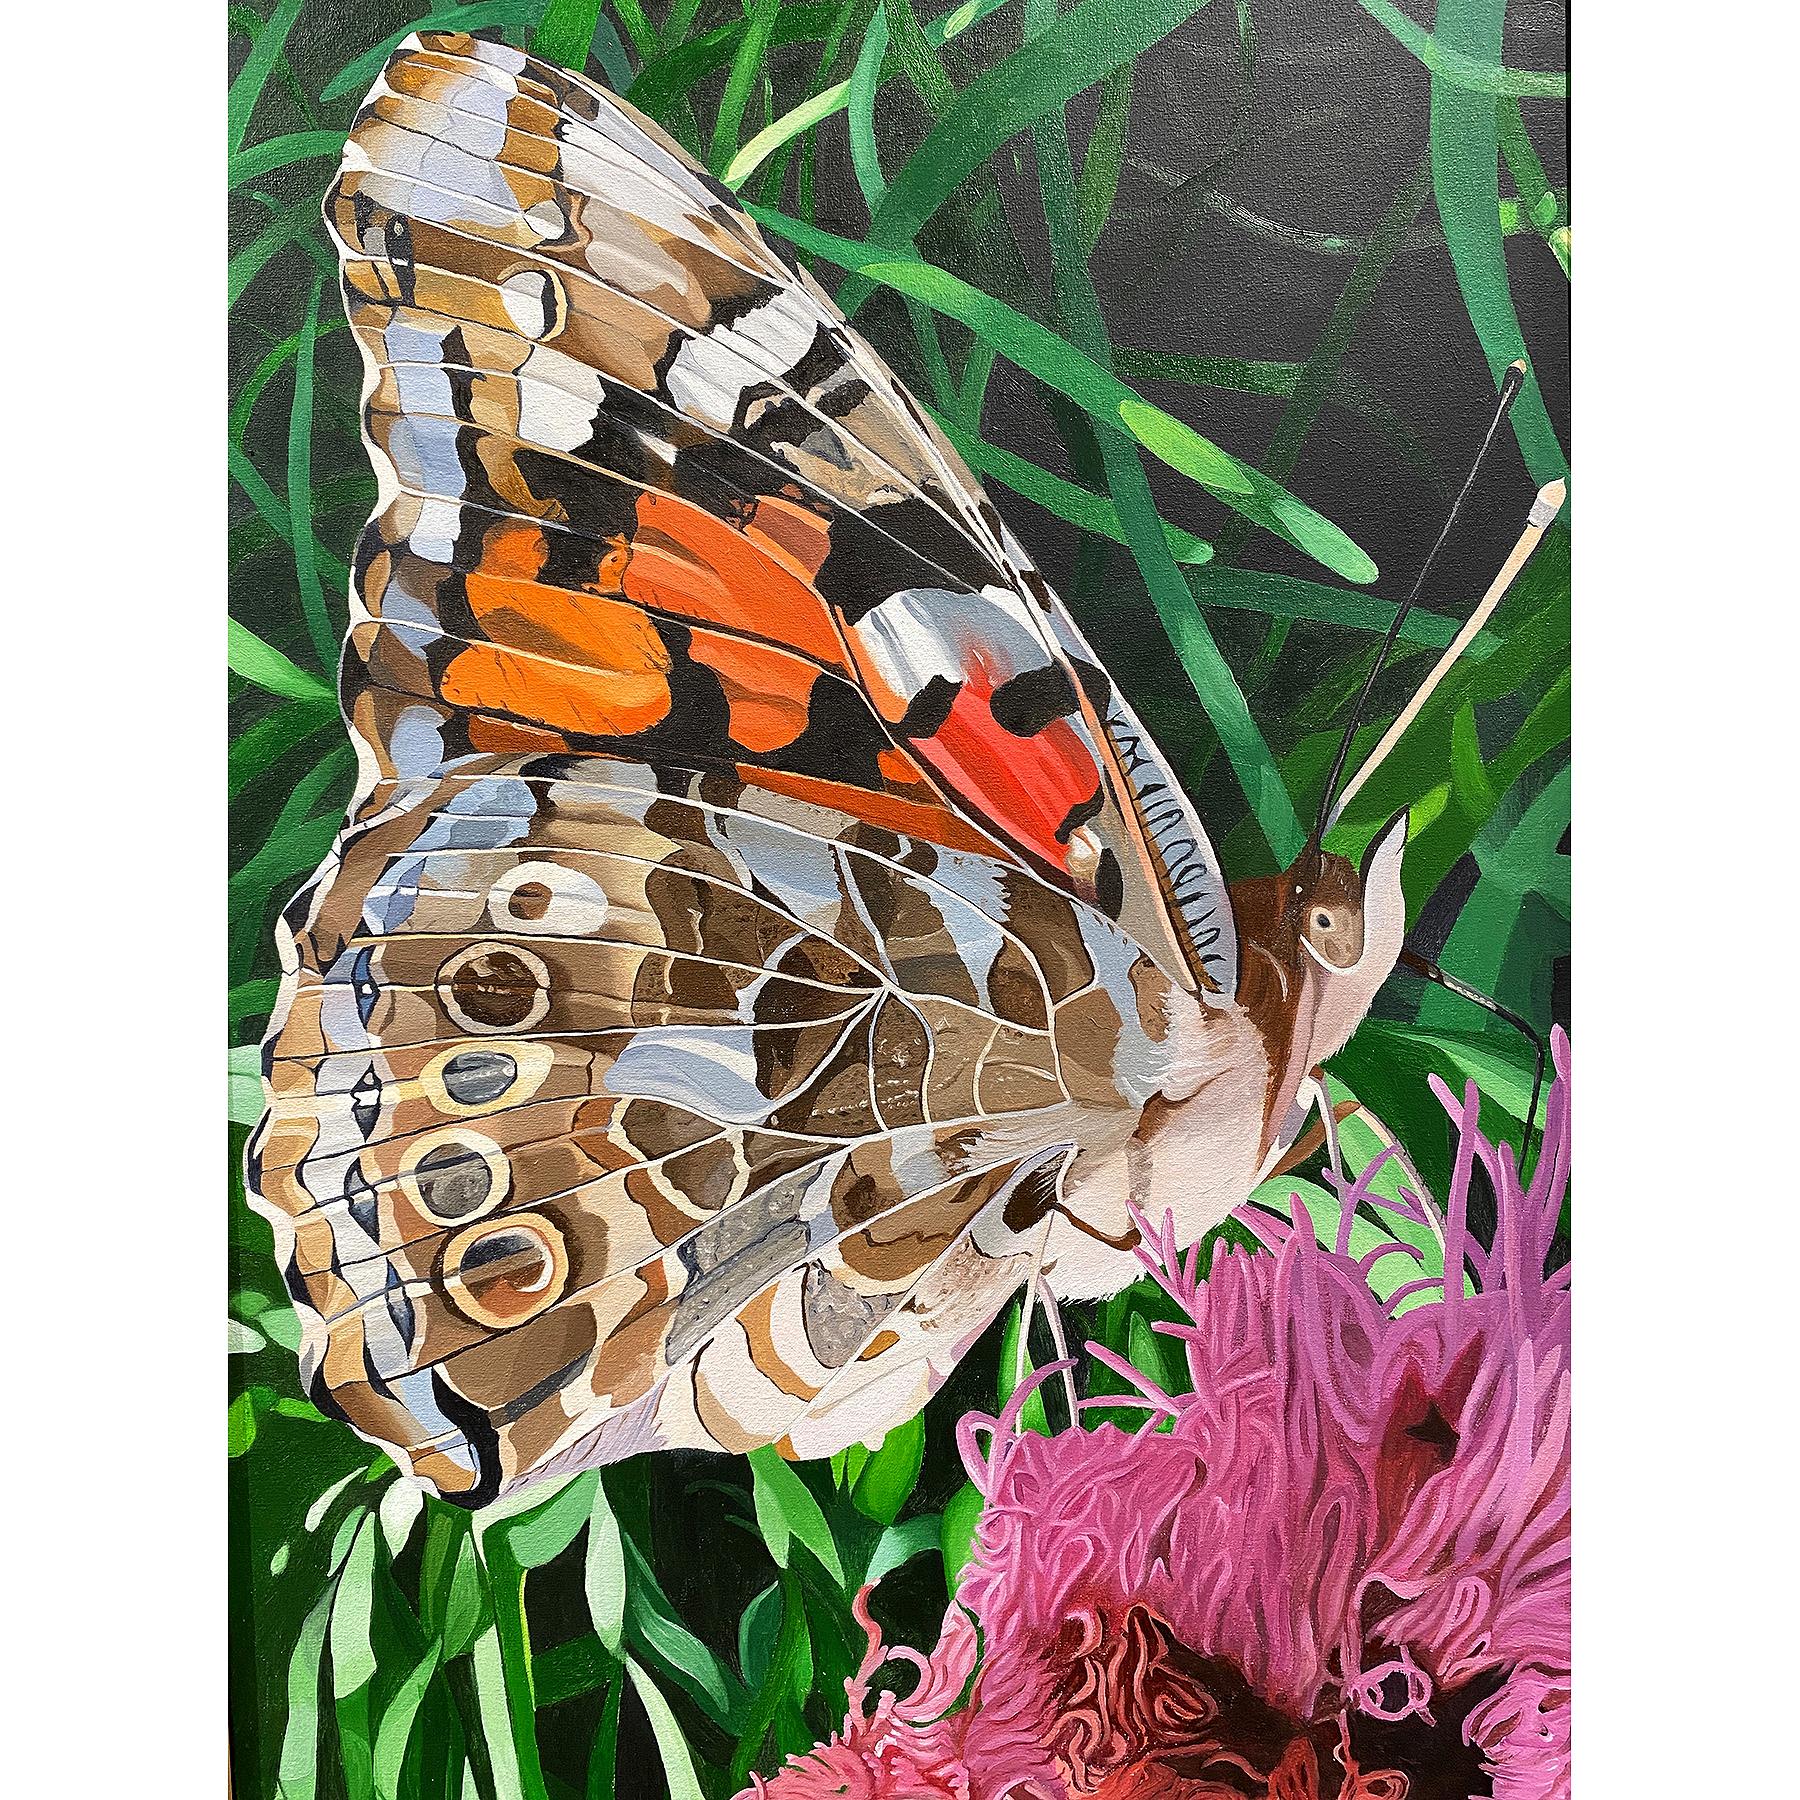 Steinem_Painted Lady_oil_25x18_